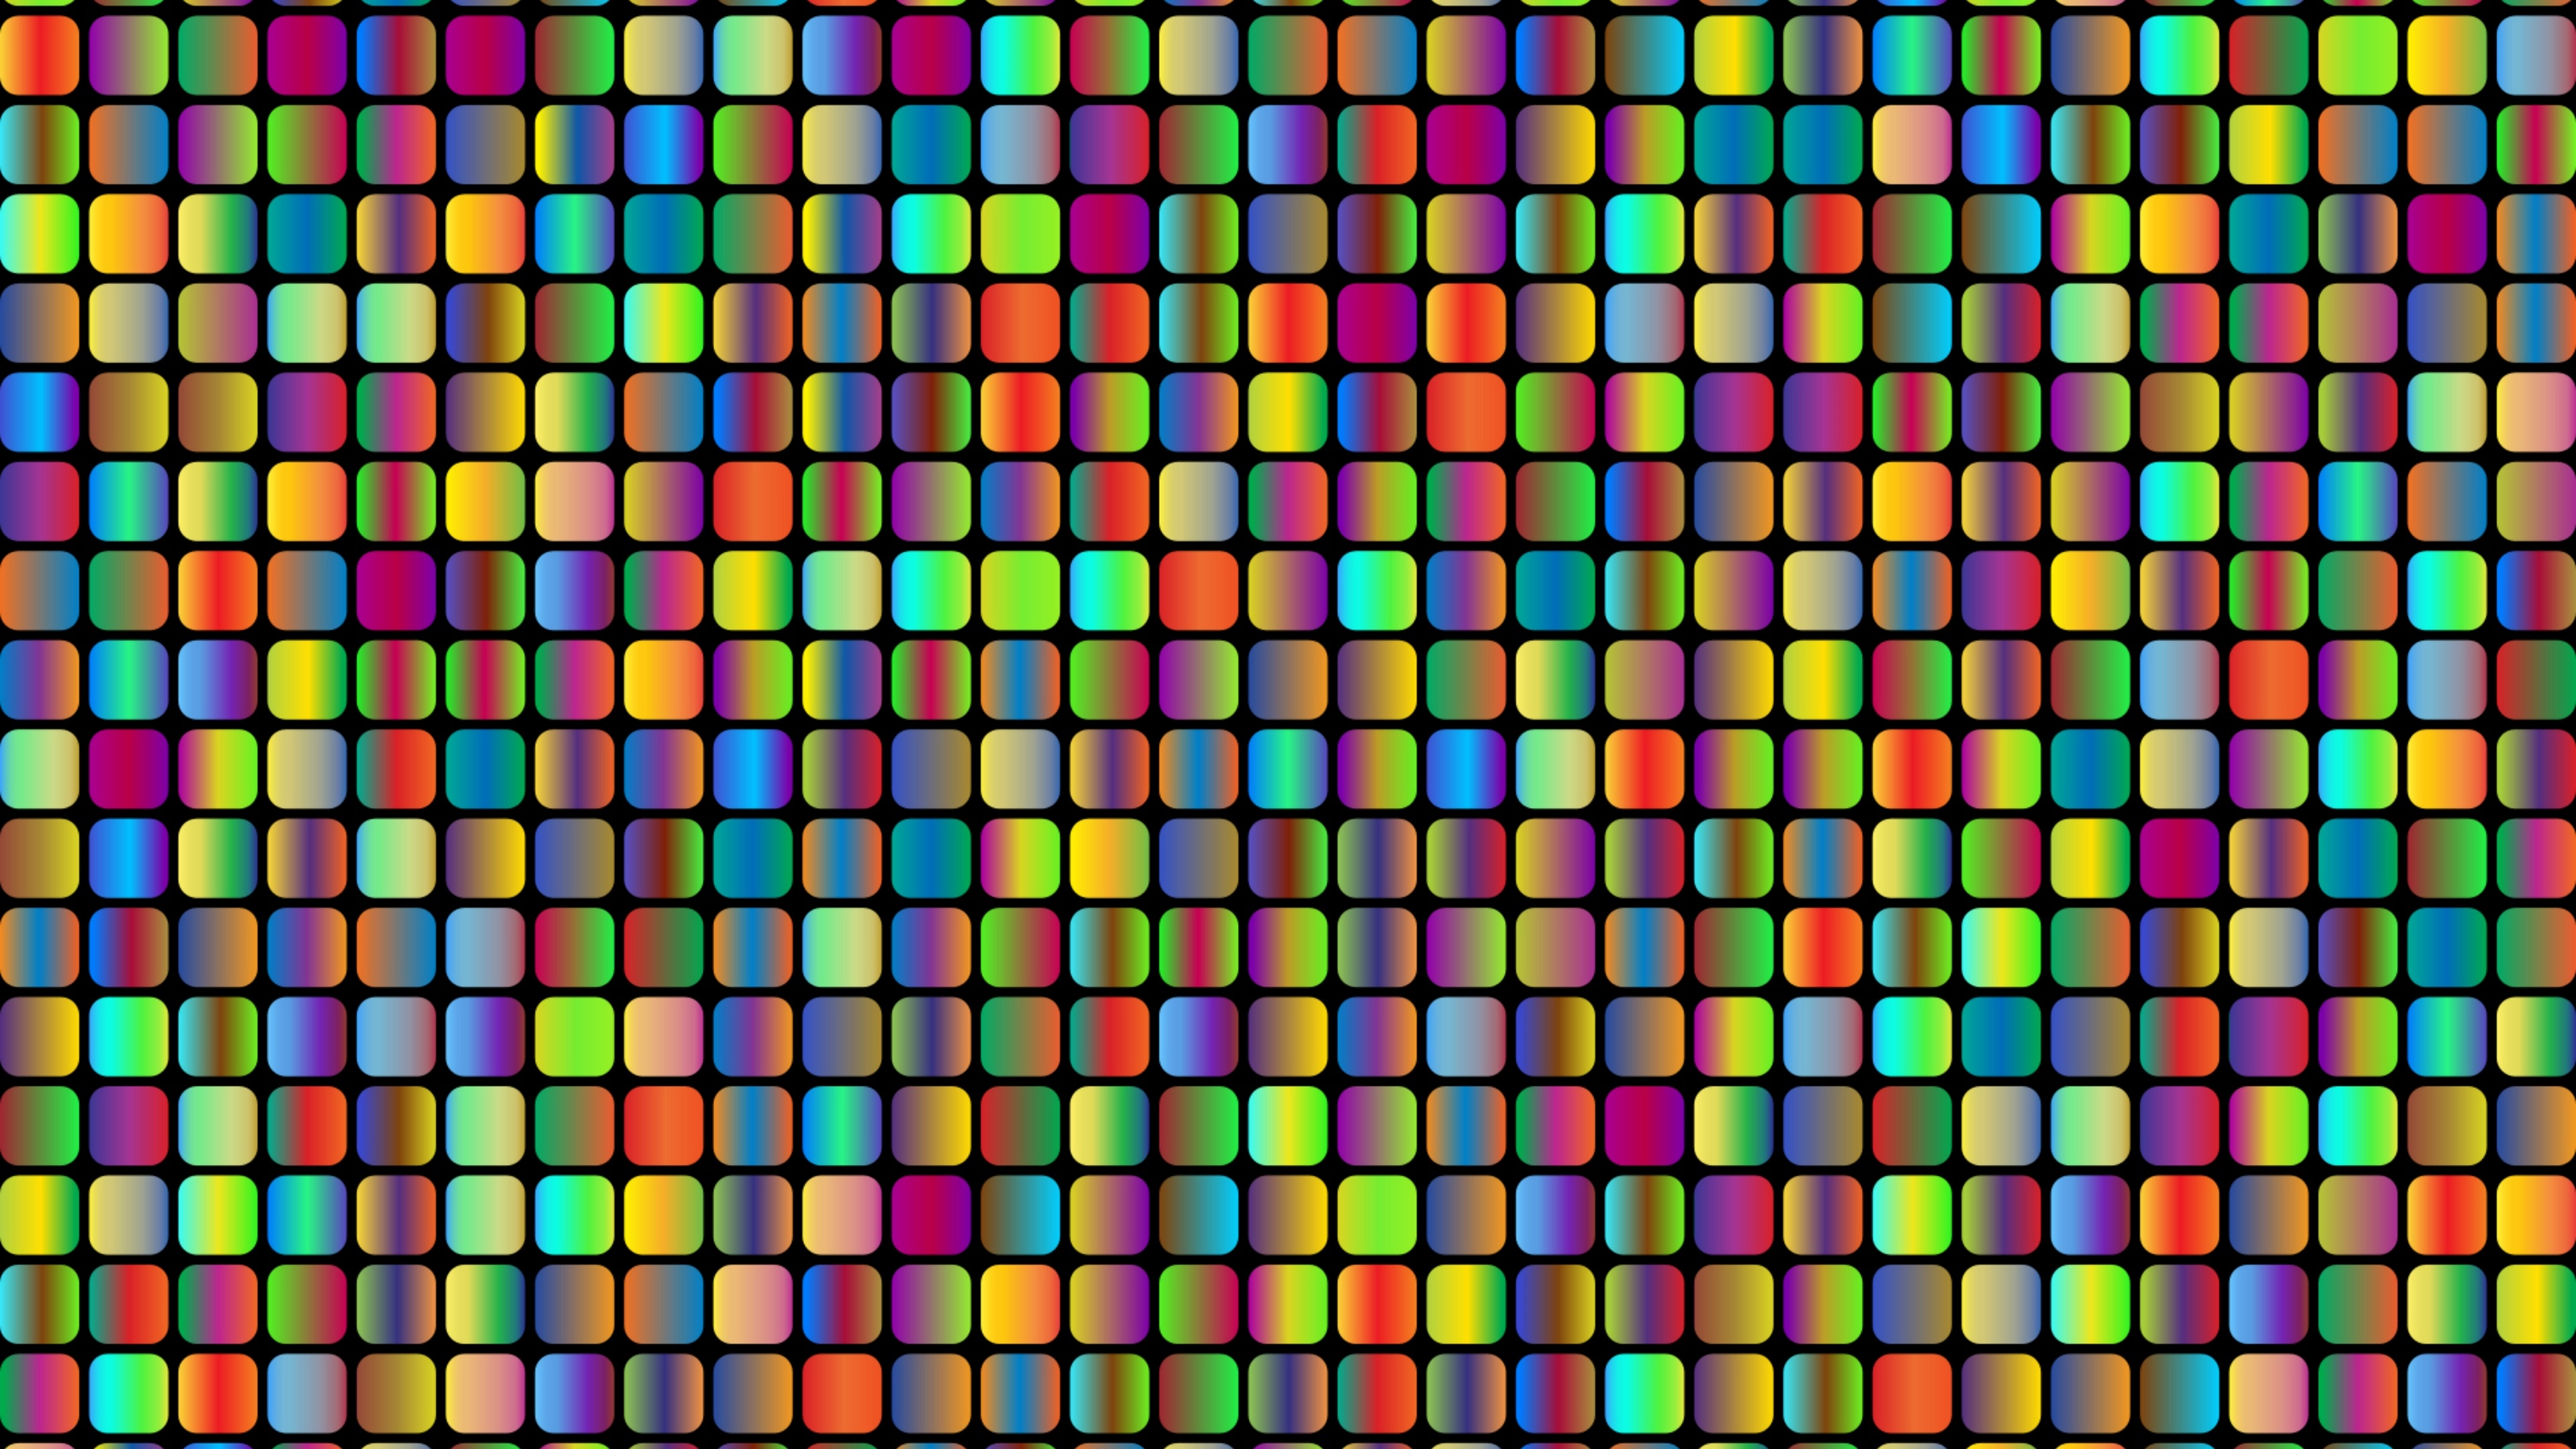 Colorful mosaic design wallpaper